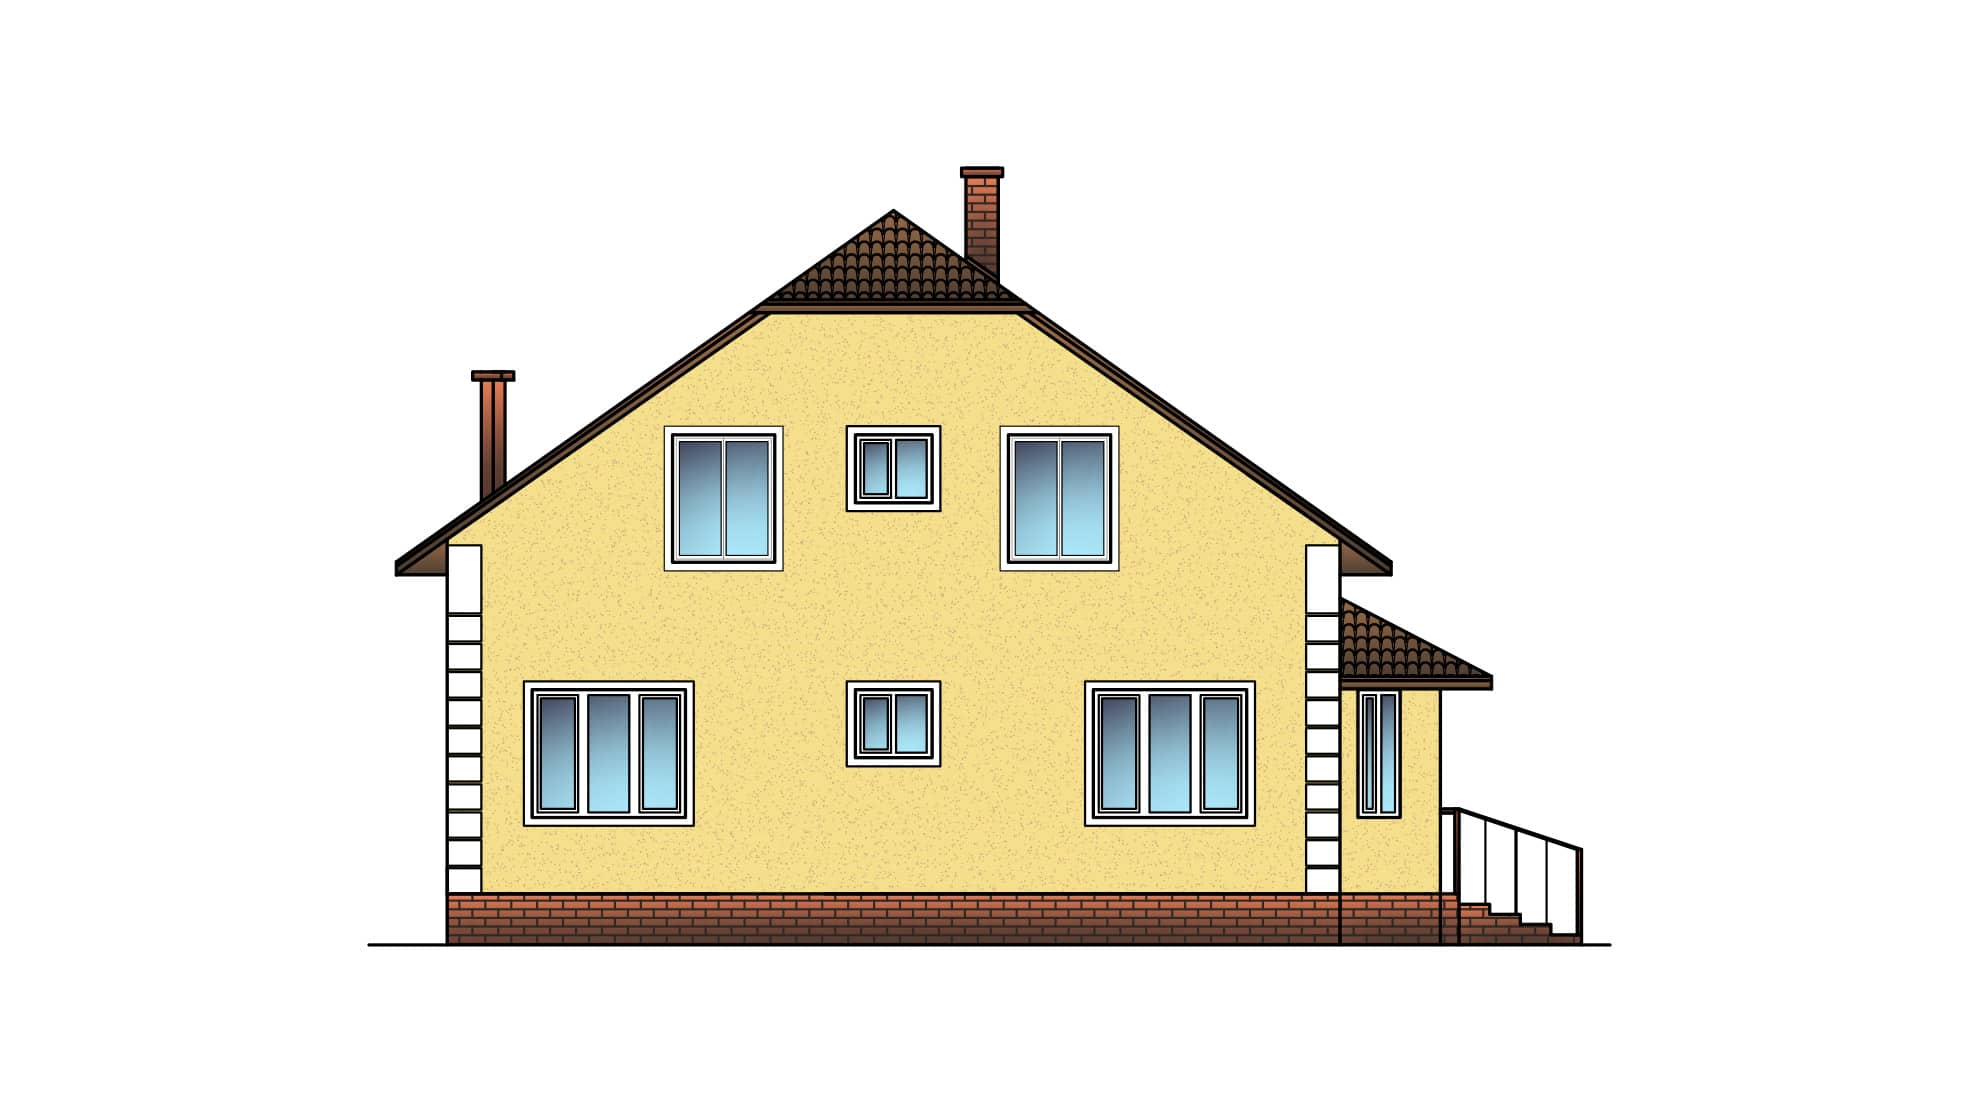 Фасад мансардного дома с гаражом «КМ-19» - слева